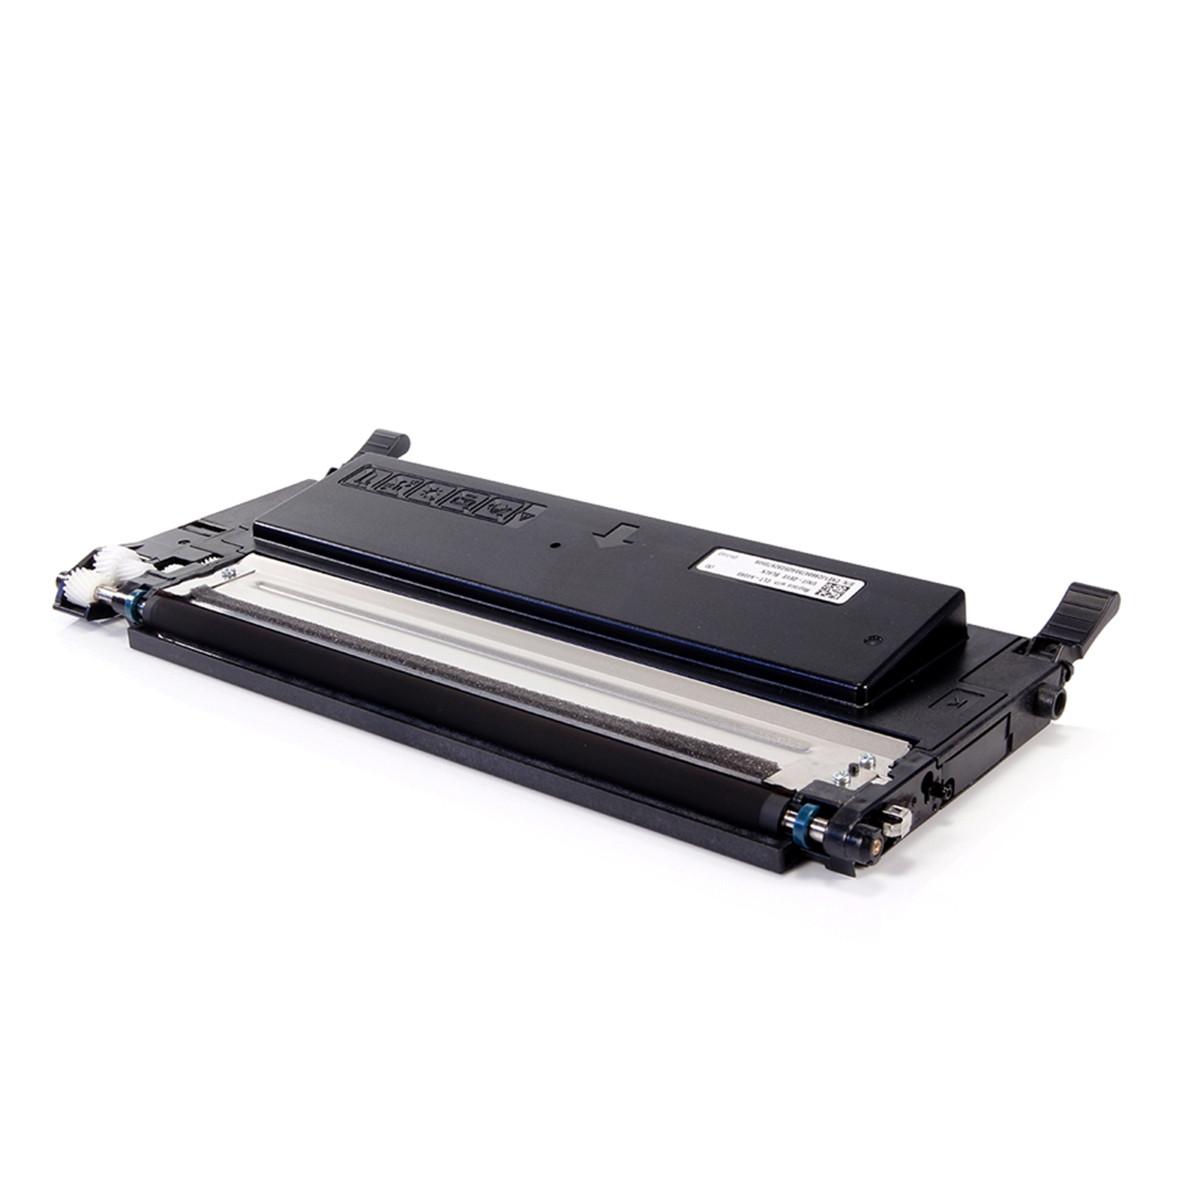 Toner Compatível Samsung CLT-K409S CLTK409S Preto | CLP310 CLP315 CLX3170 CLX3175 | Premium 1.5k